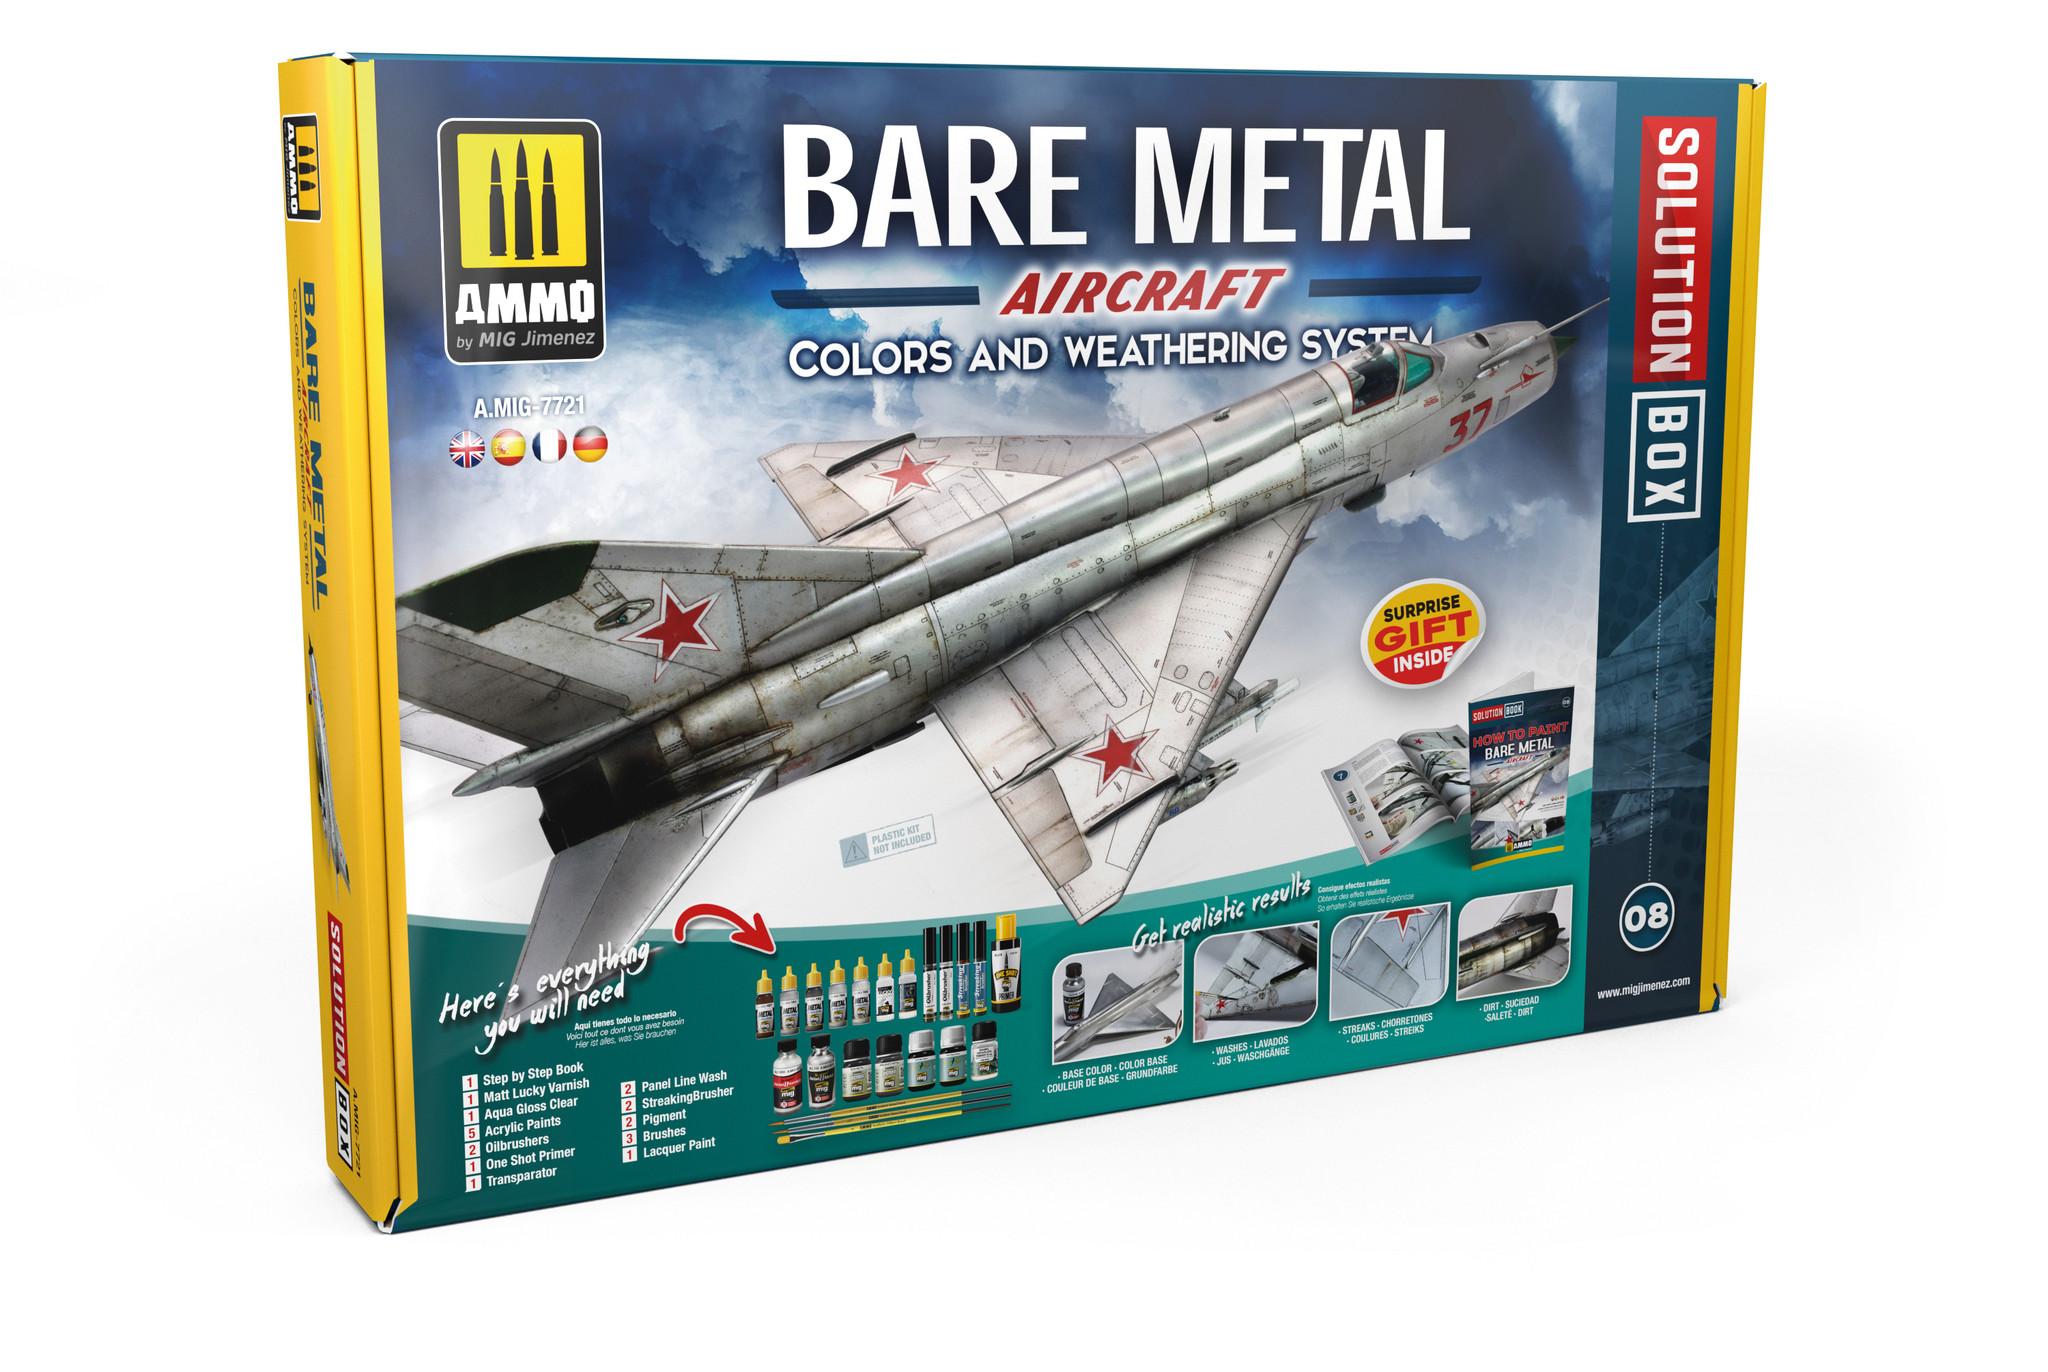 Ammo by Mig Jimenez Solution Box 08 Bare Metal Aircraft - Ammo by Mig Jimenez - A.MIG-7721